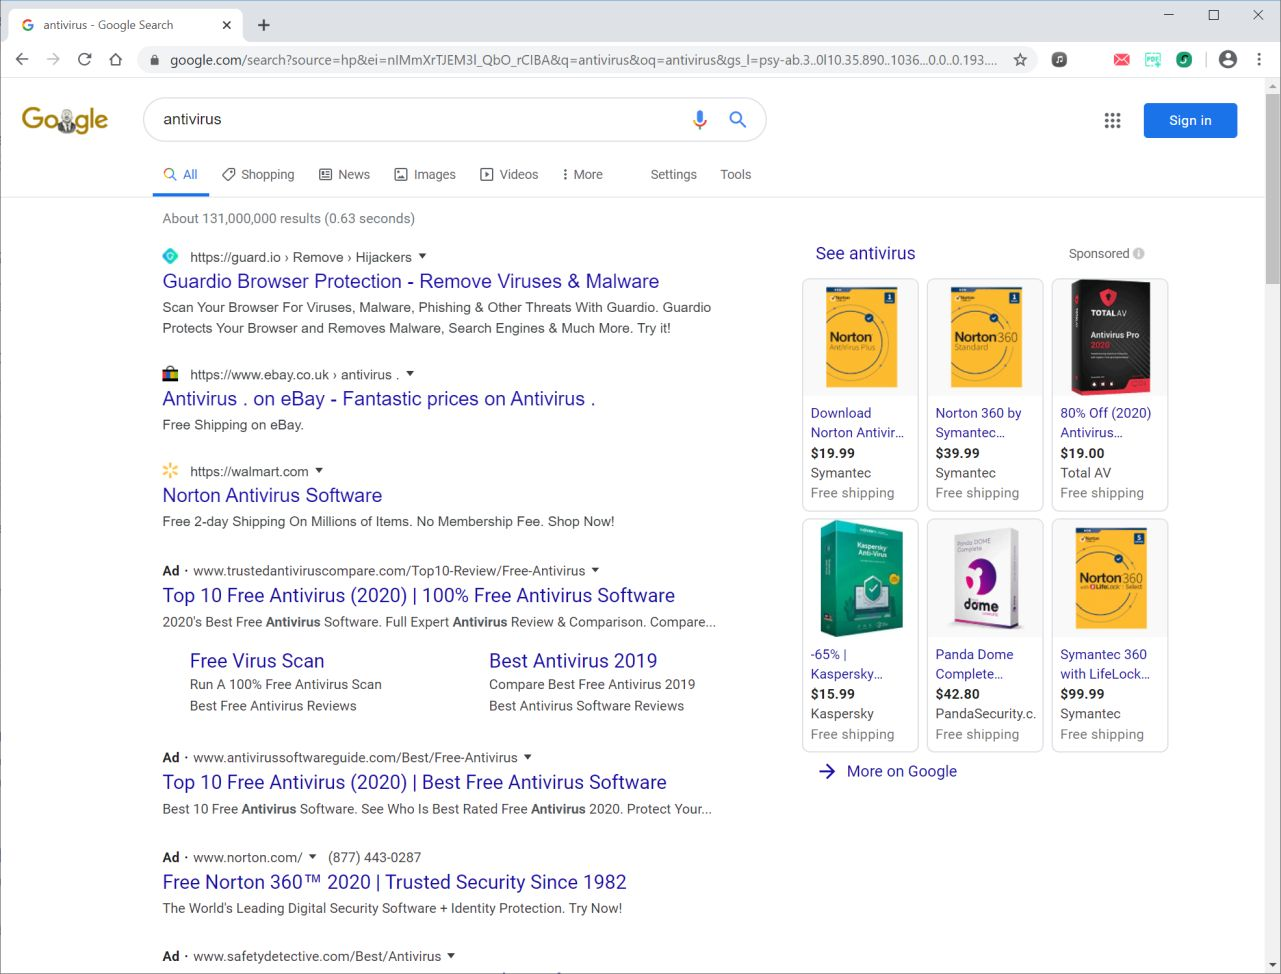 Image: SearchReceipts Ads